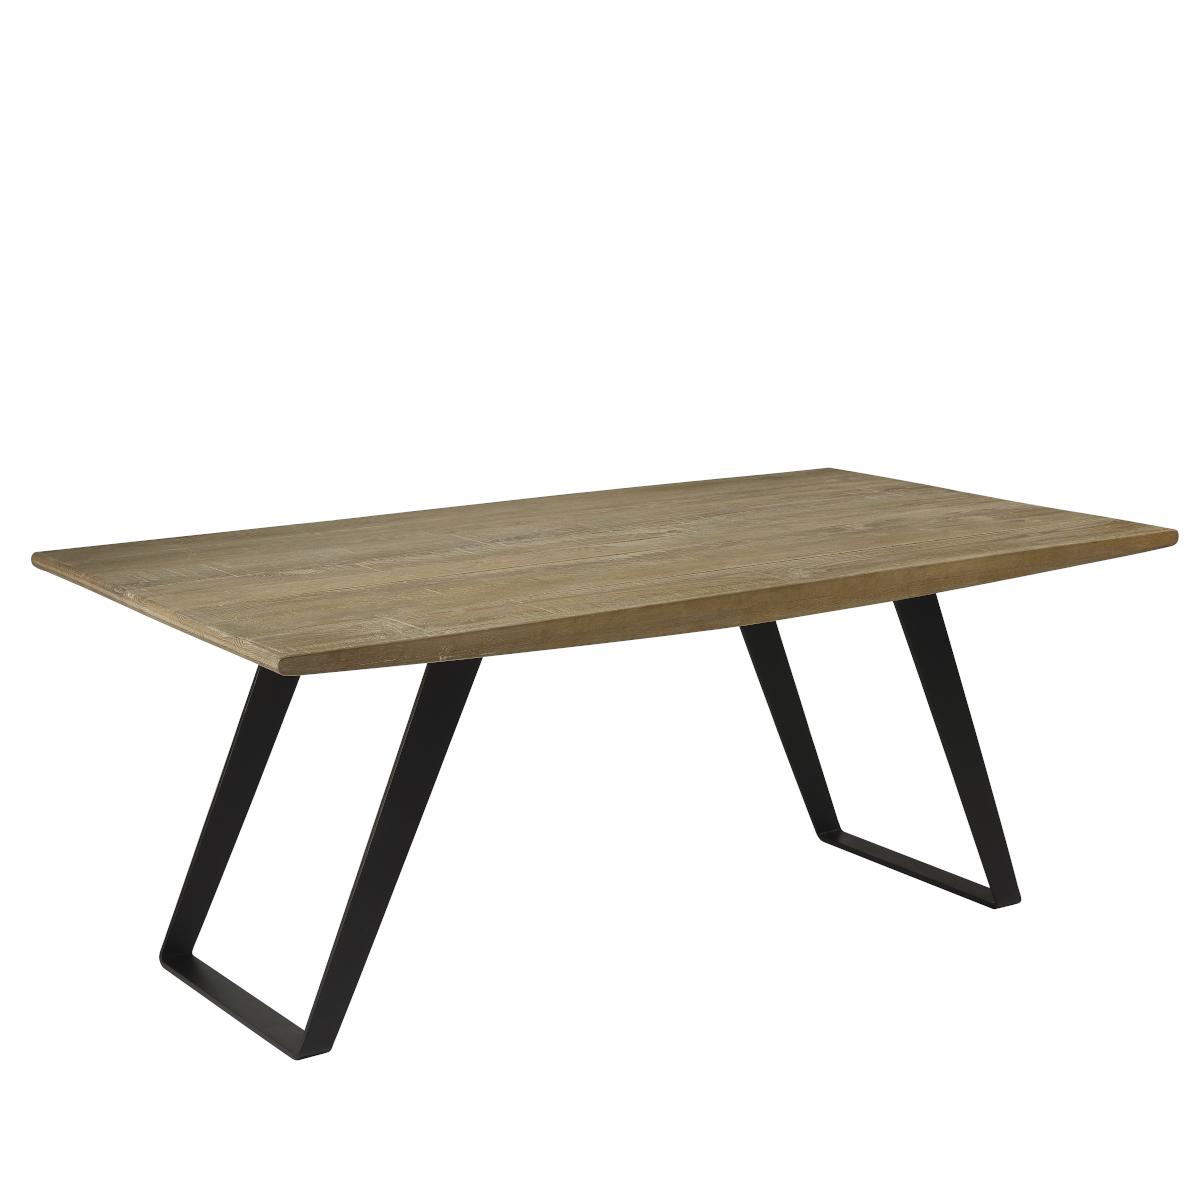 Table plateau chêne pied métal